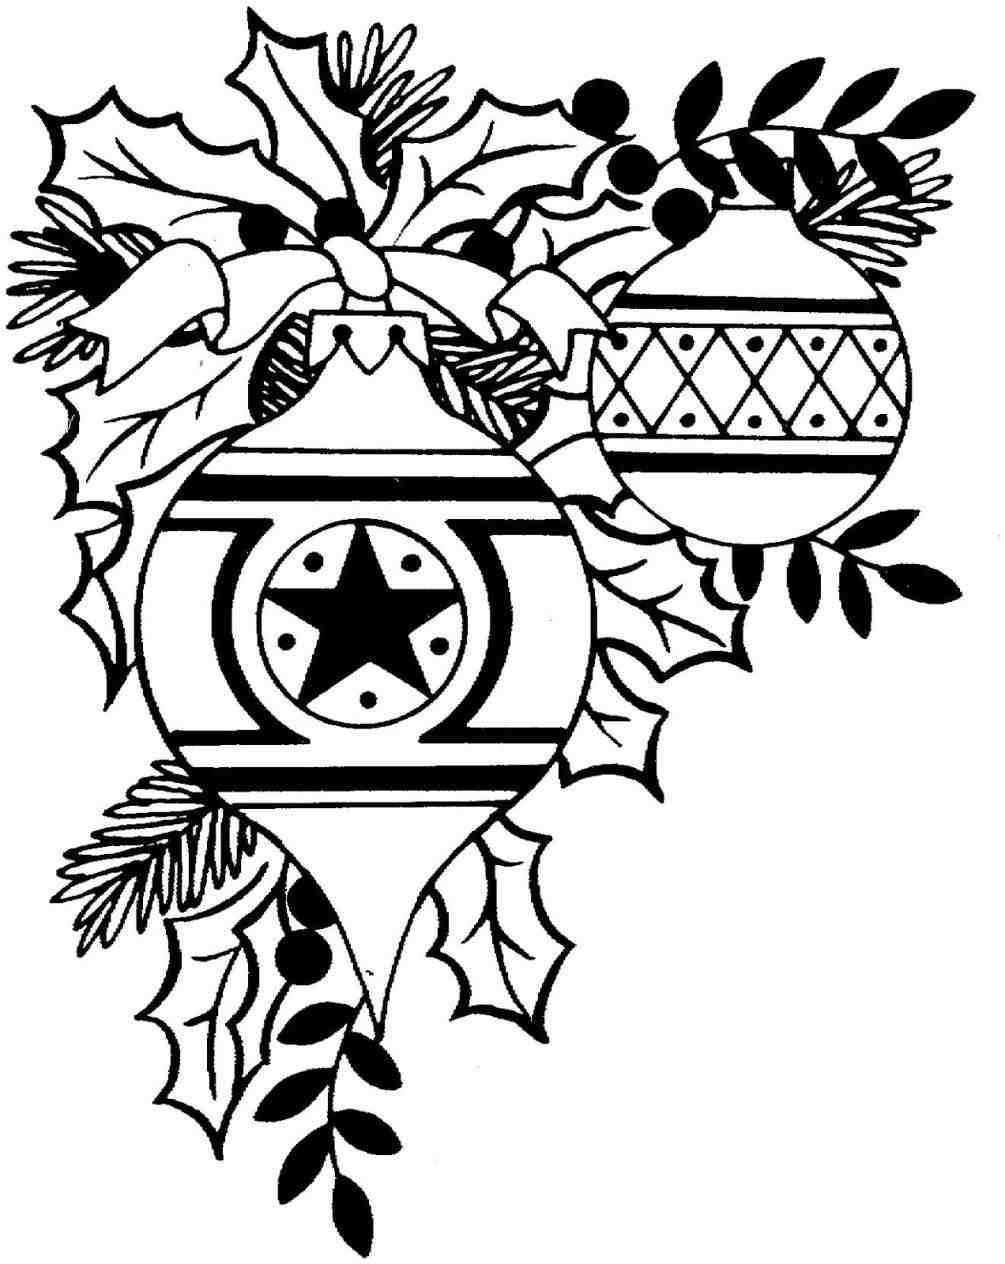 1005x1264 Free Black And White Christmas Borders Cheminee.website